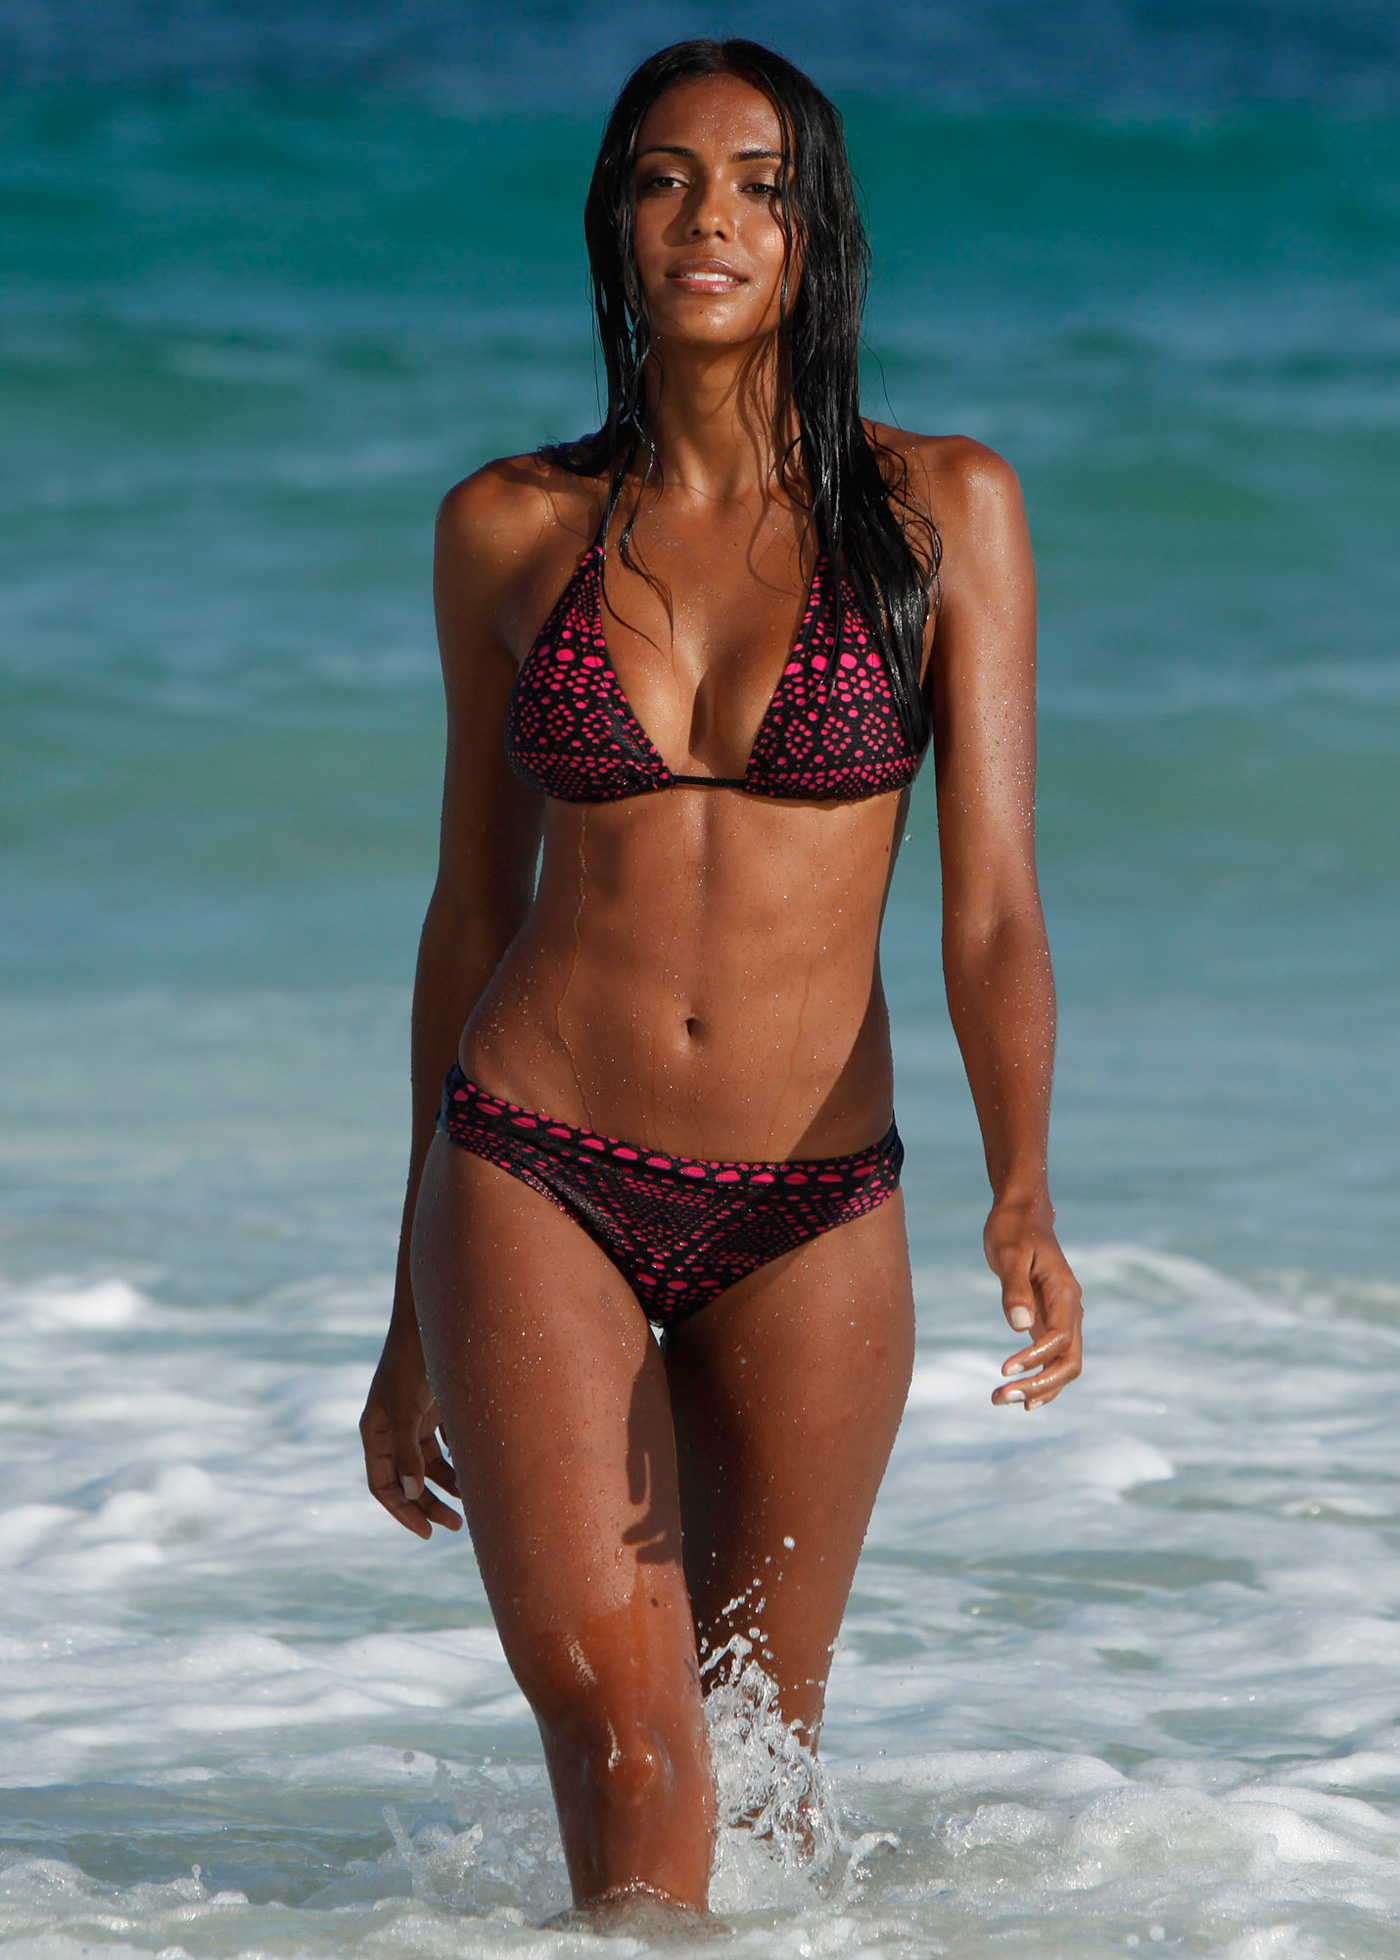 Fernanda Marques in a bikini